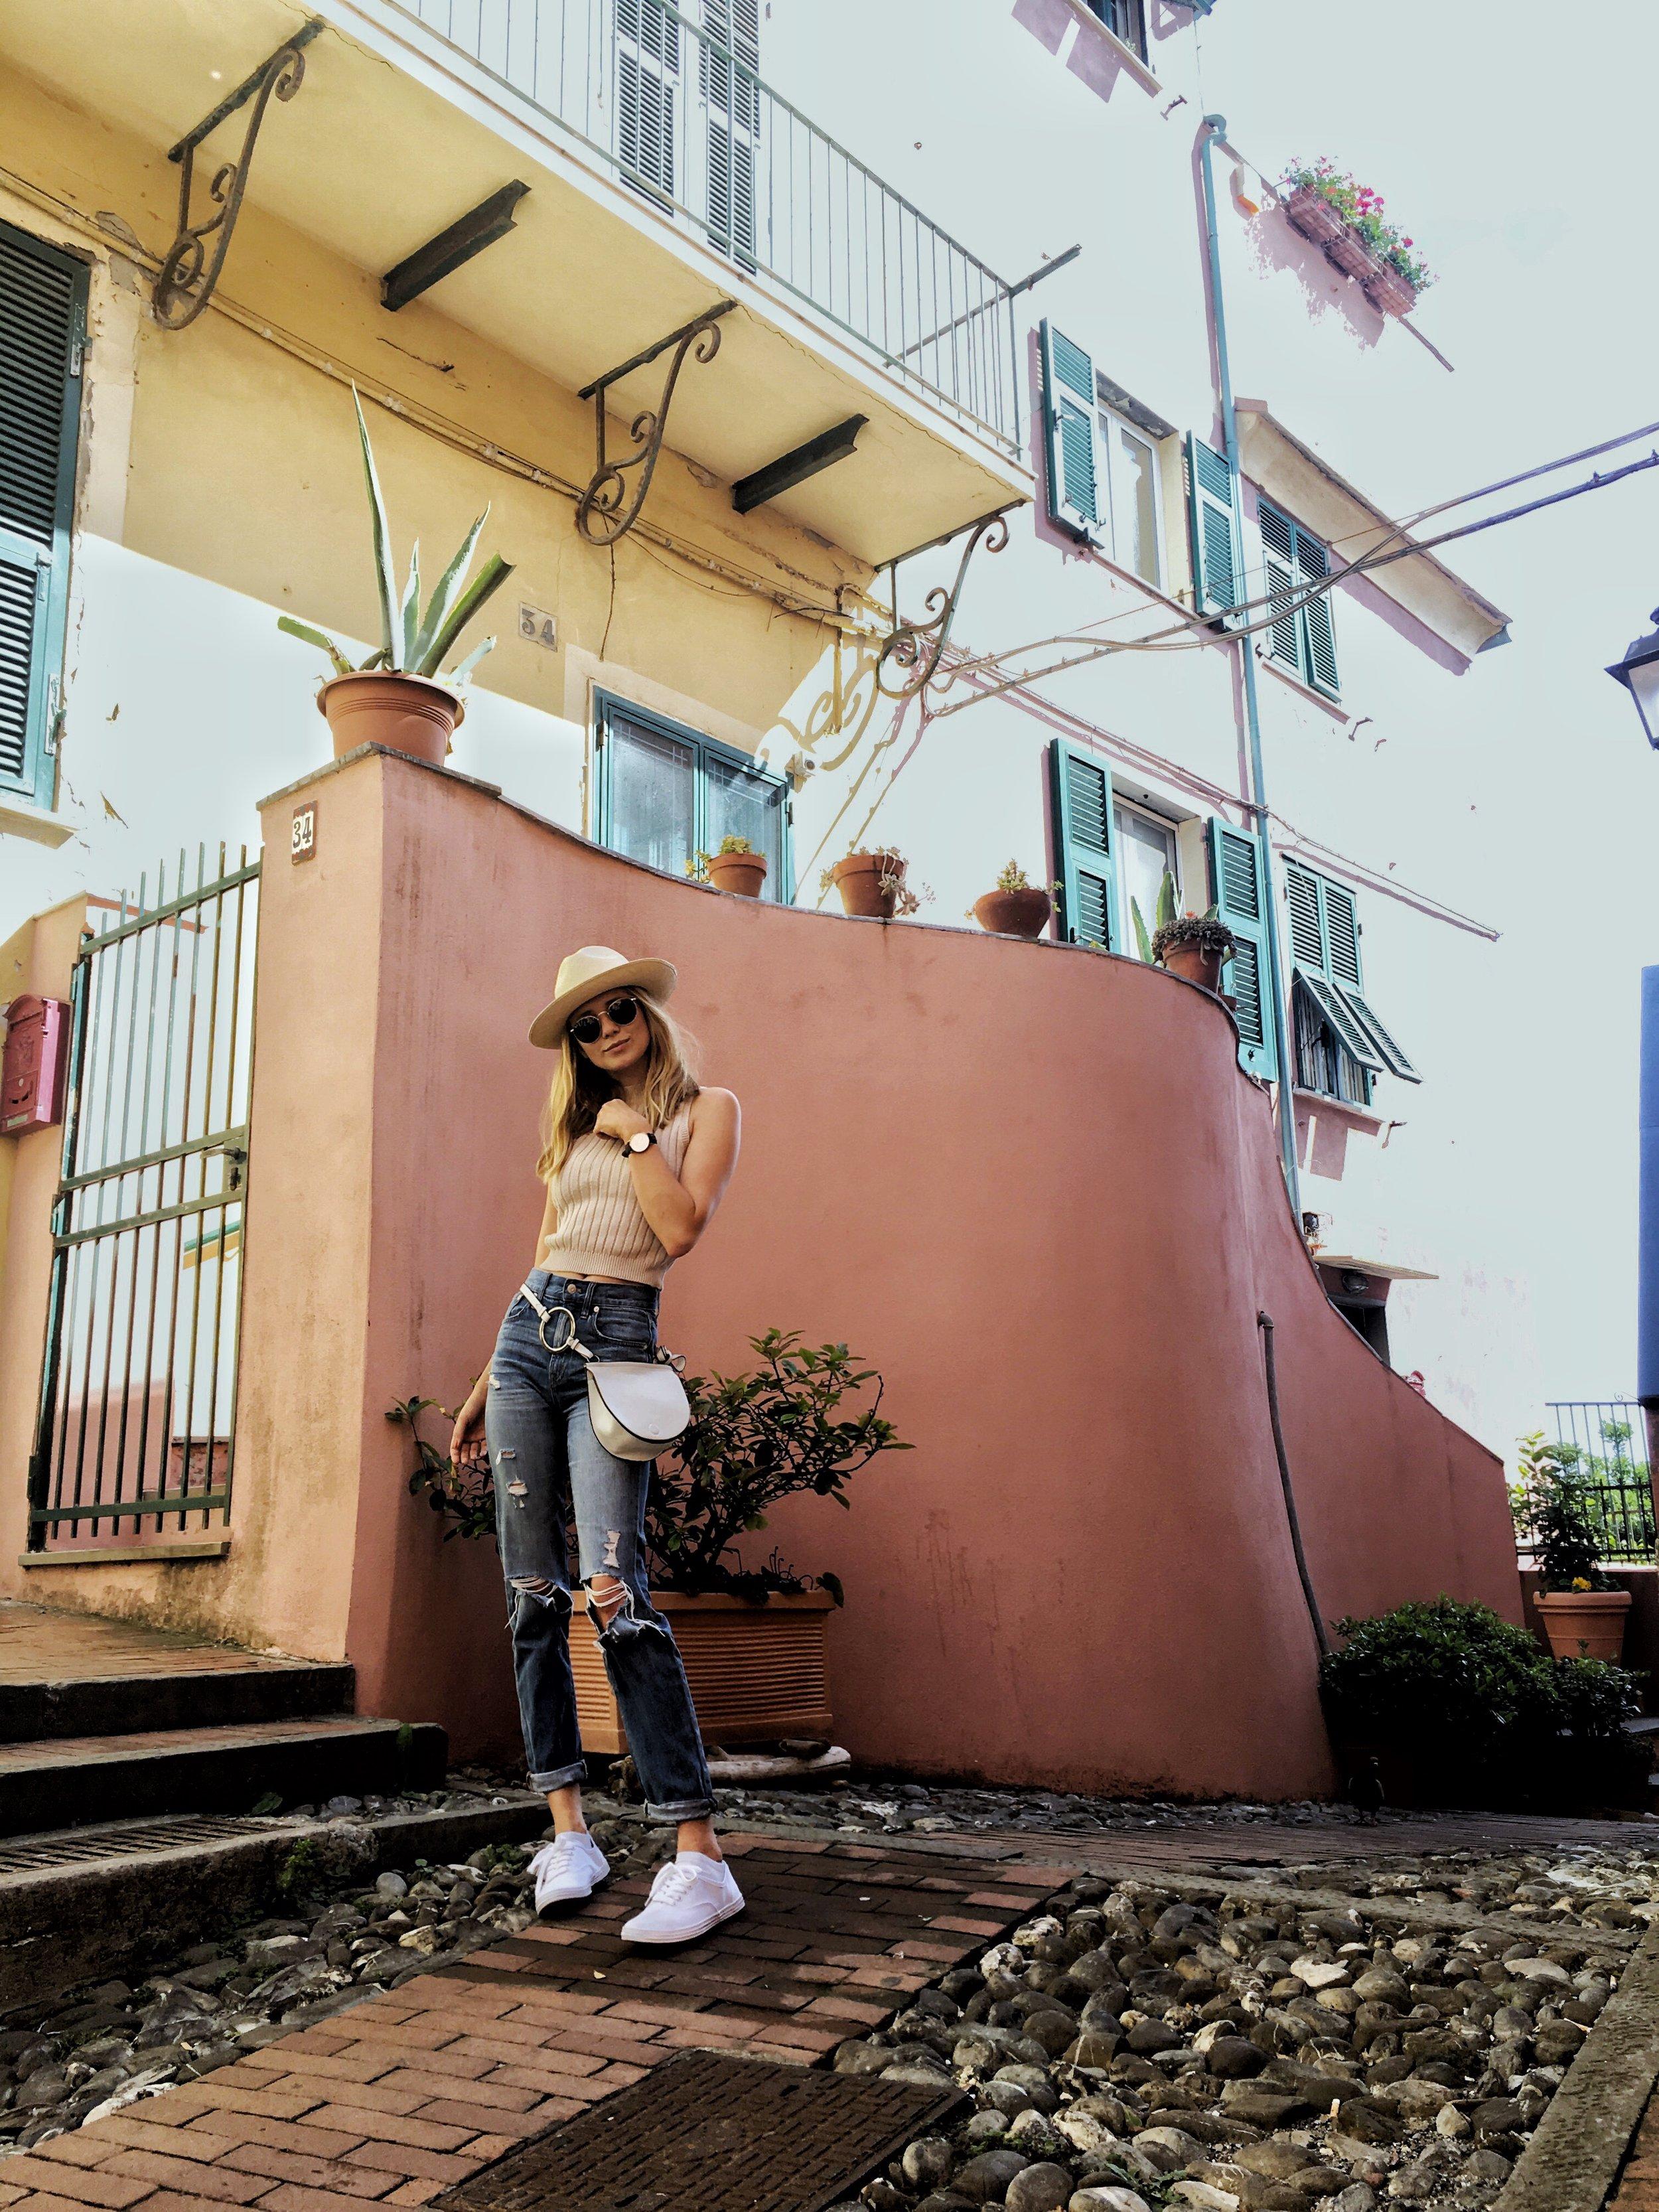 Alleys of Boccadasse, a neighborhood in Genova, Italy